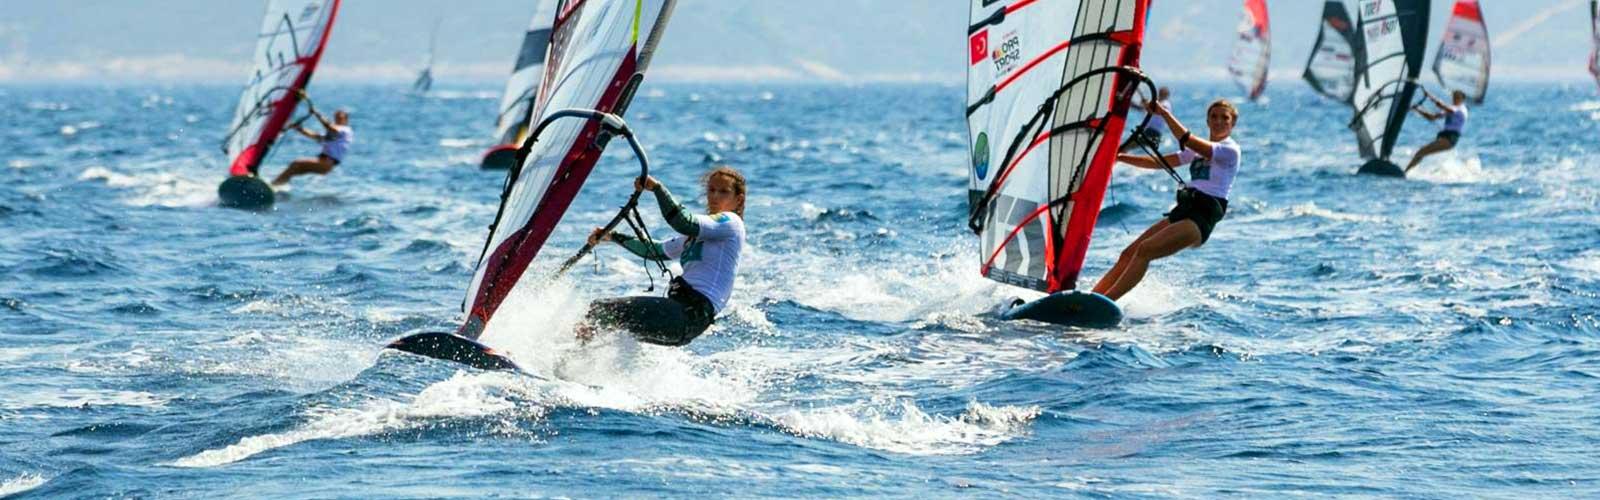 Alacati Windsurfing School Kids